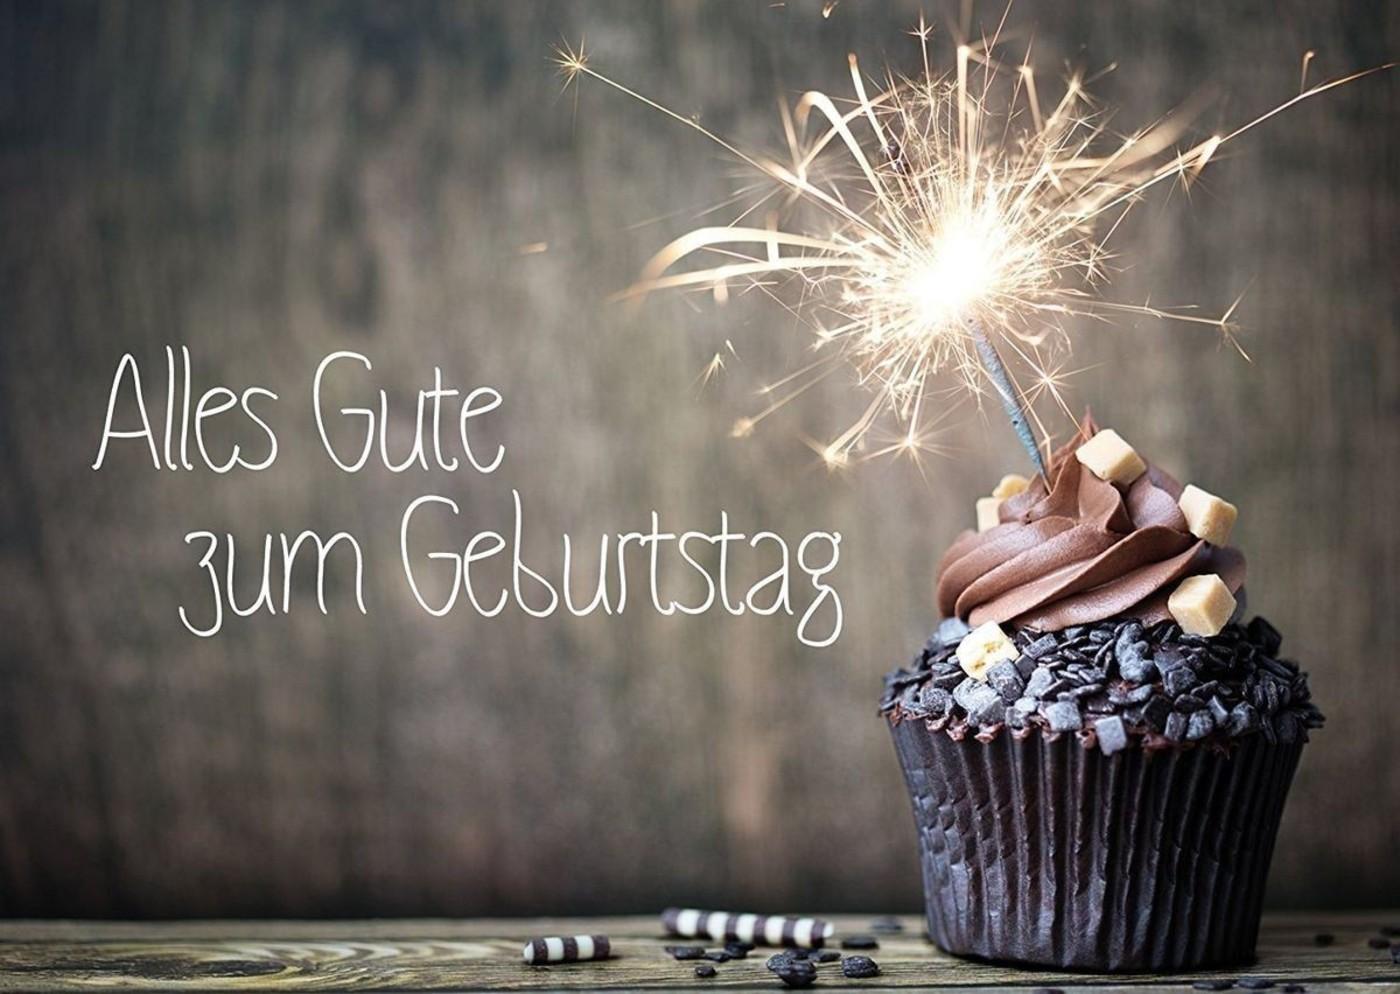 The Story Of Geburtstag Grusse Bilder Has Just Gone Viral